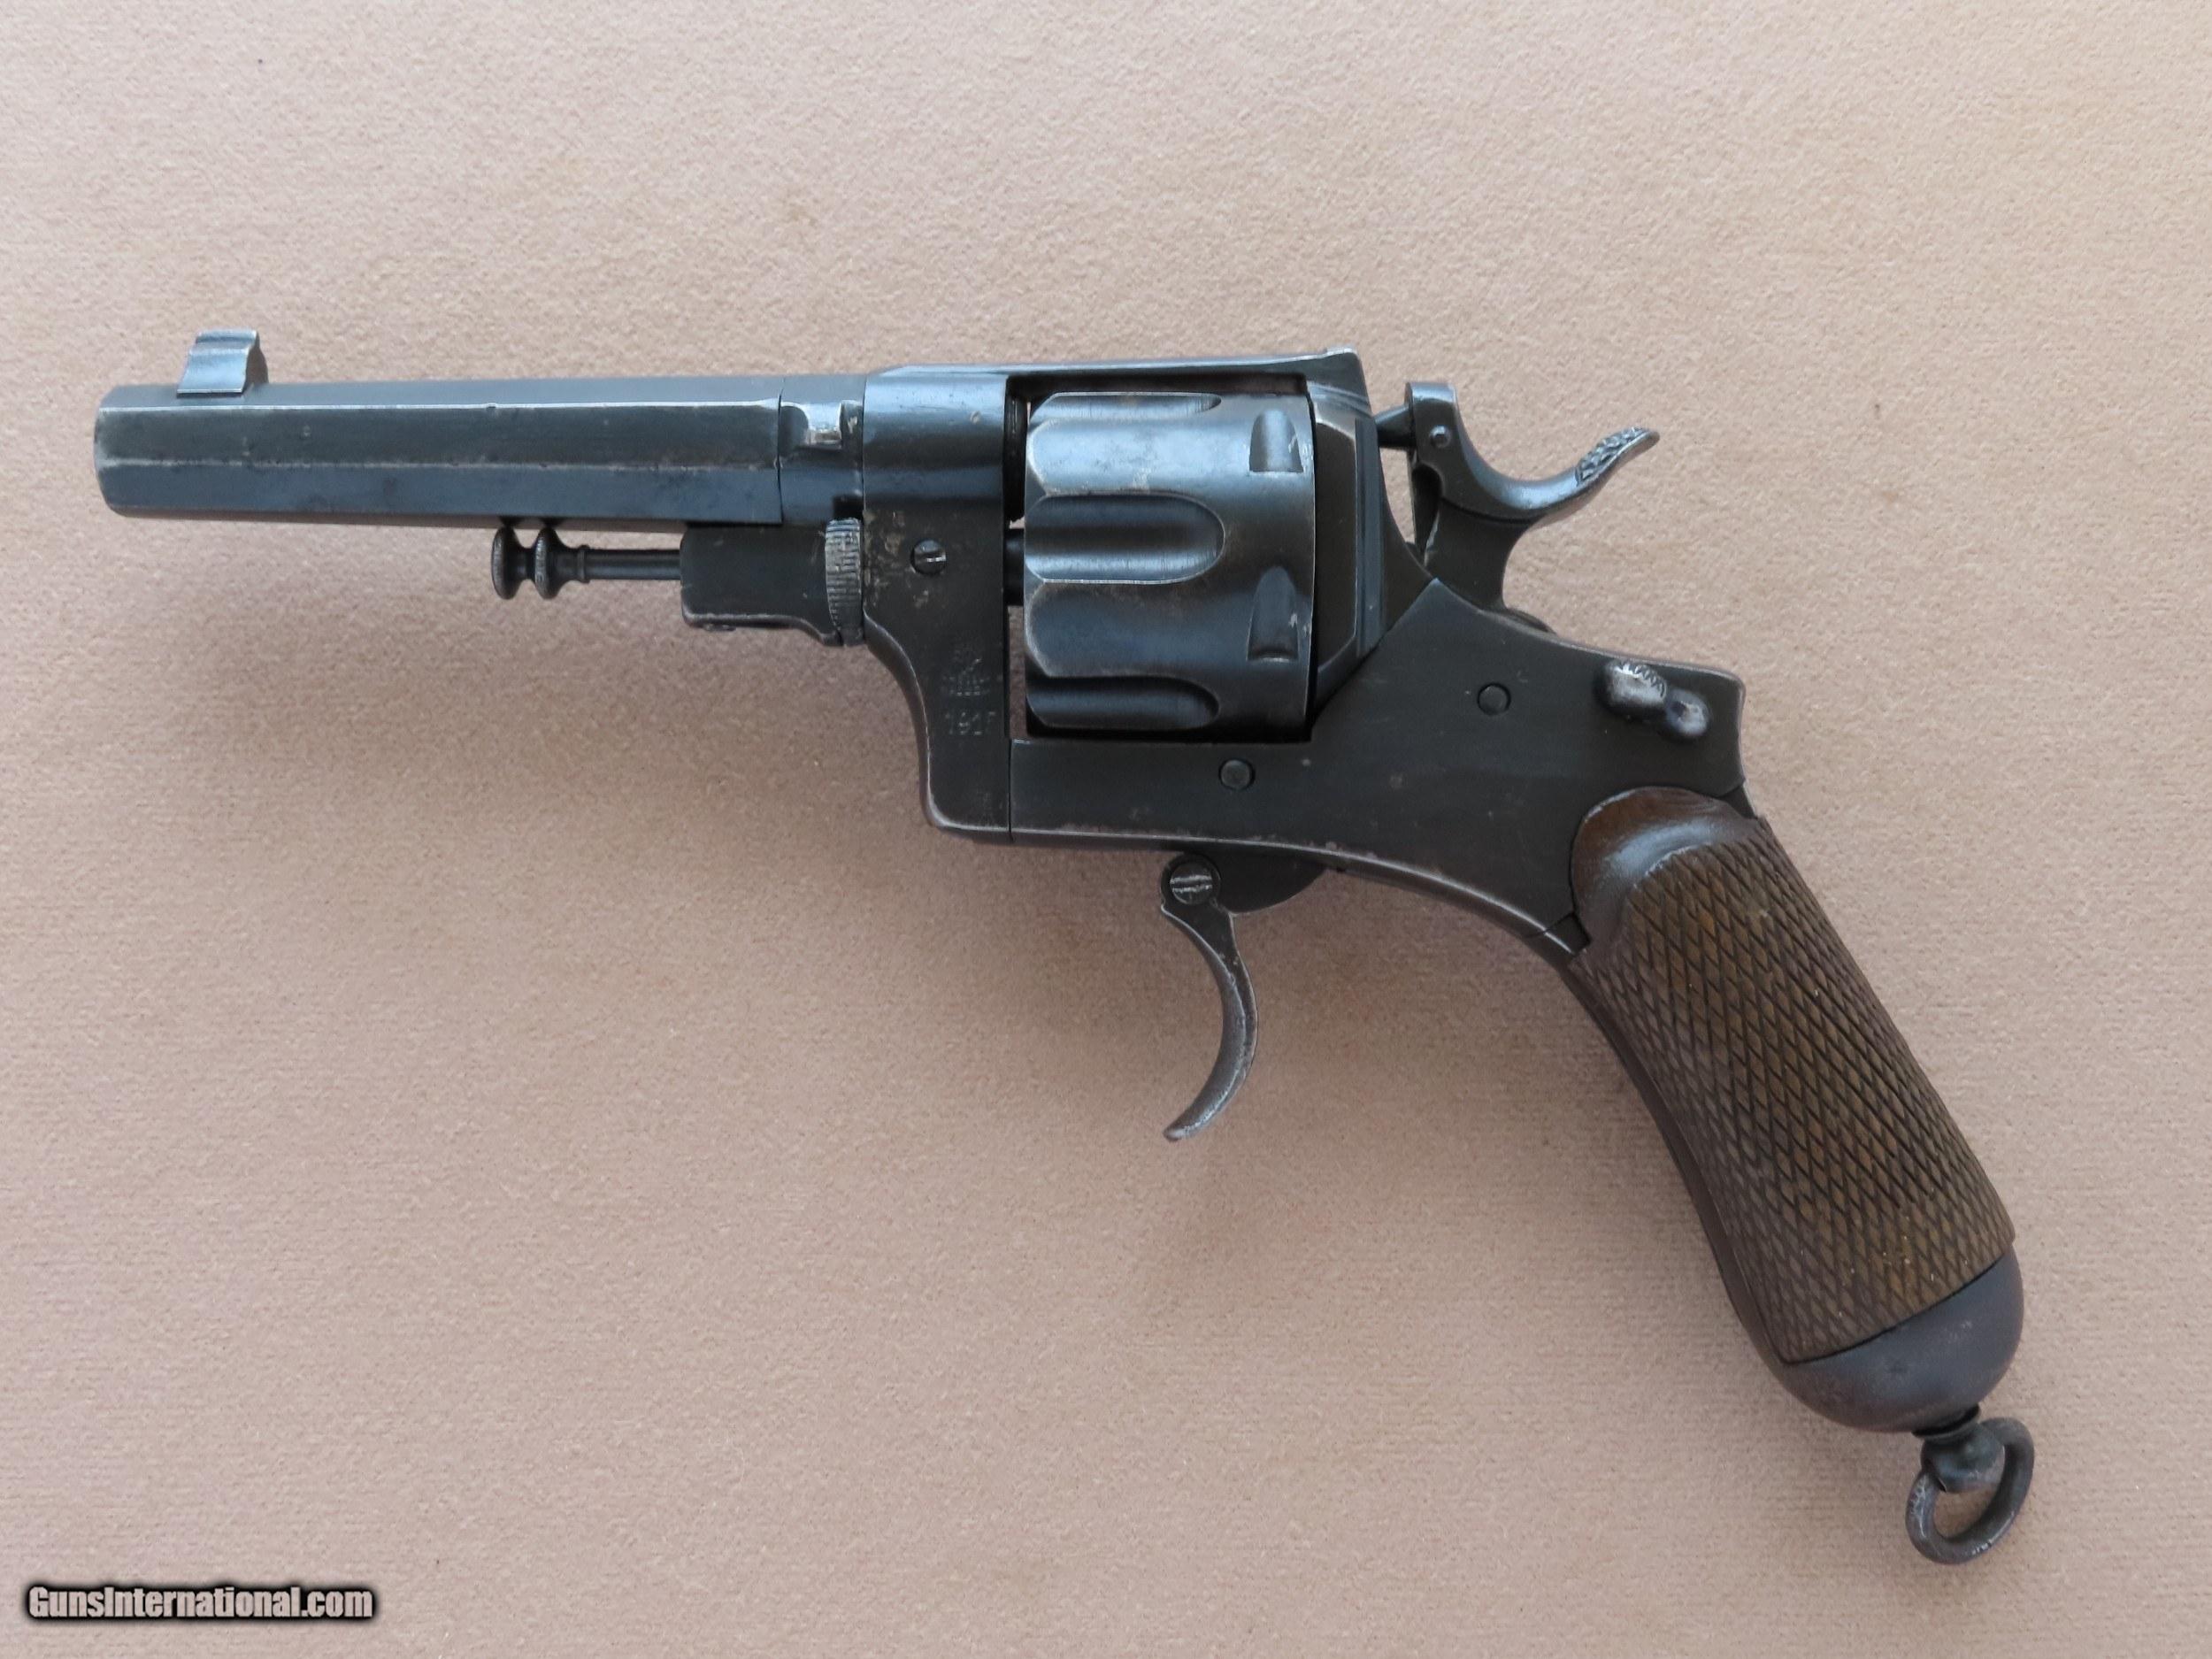 1bd0cbac9946 Italian Model 1889 Bodeo Revolver w/ Folding Trigger in 10.35mm ...